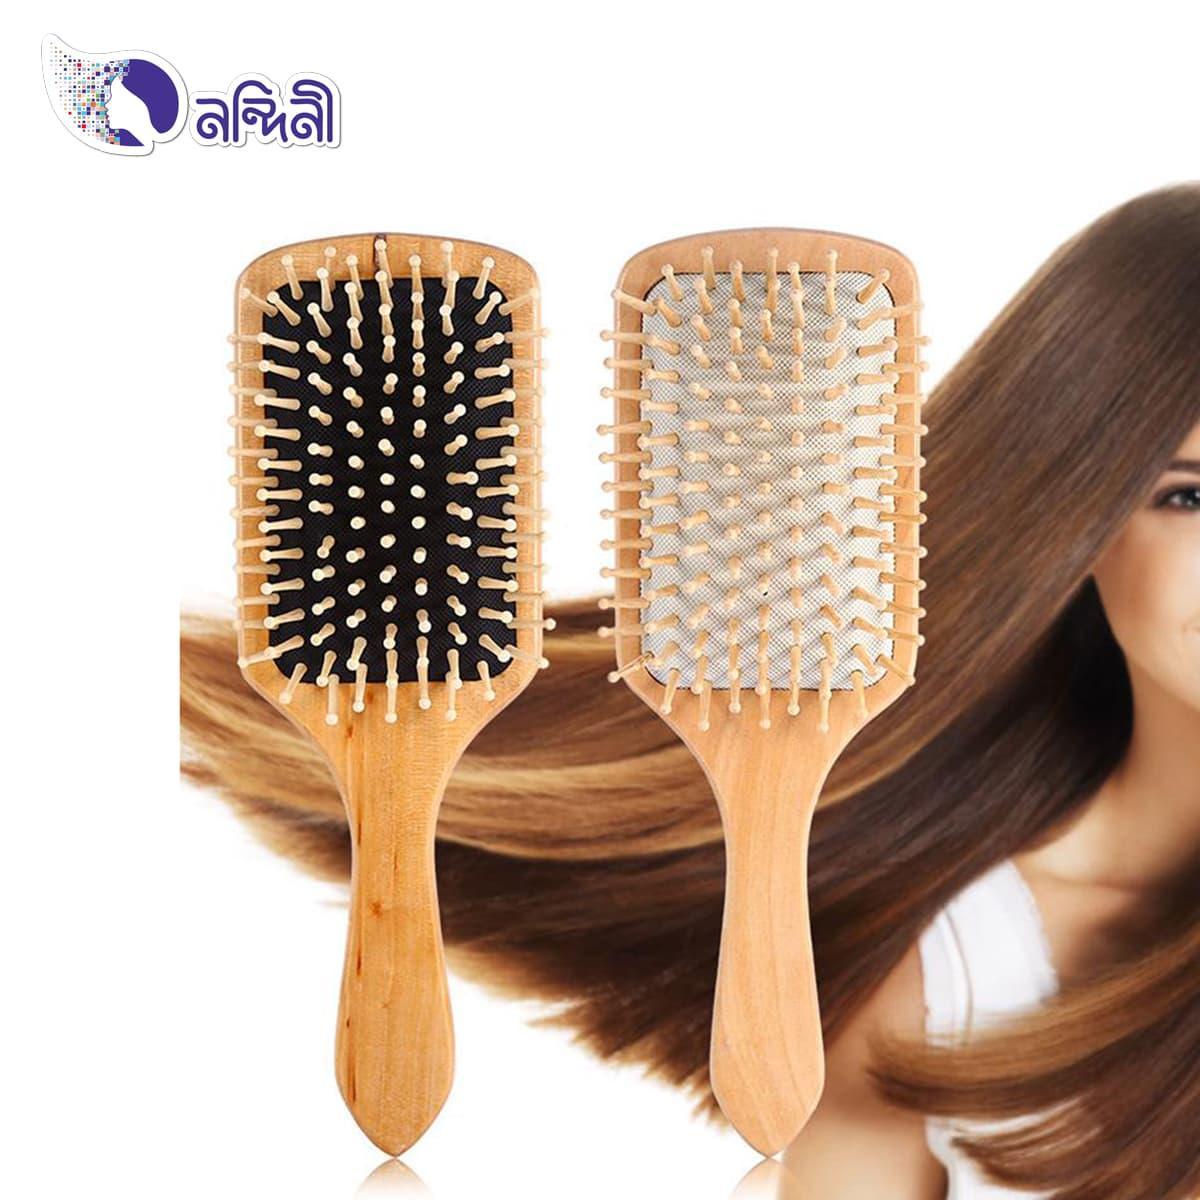 8a2c9f36f Hair Tools And Accessories Online In Bangladesh - Daraz.com.bd